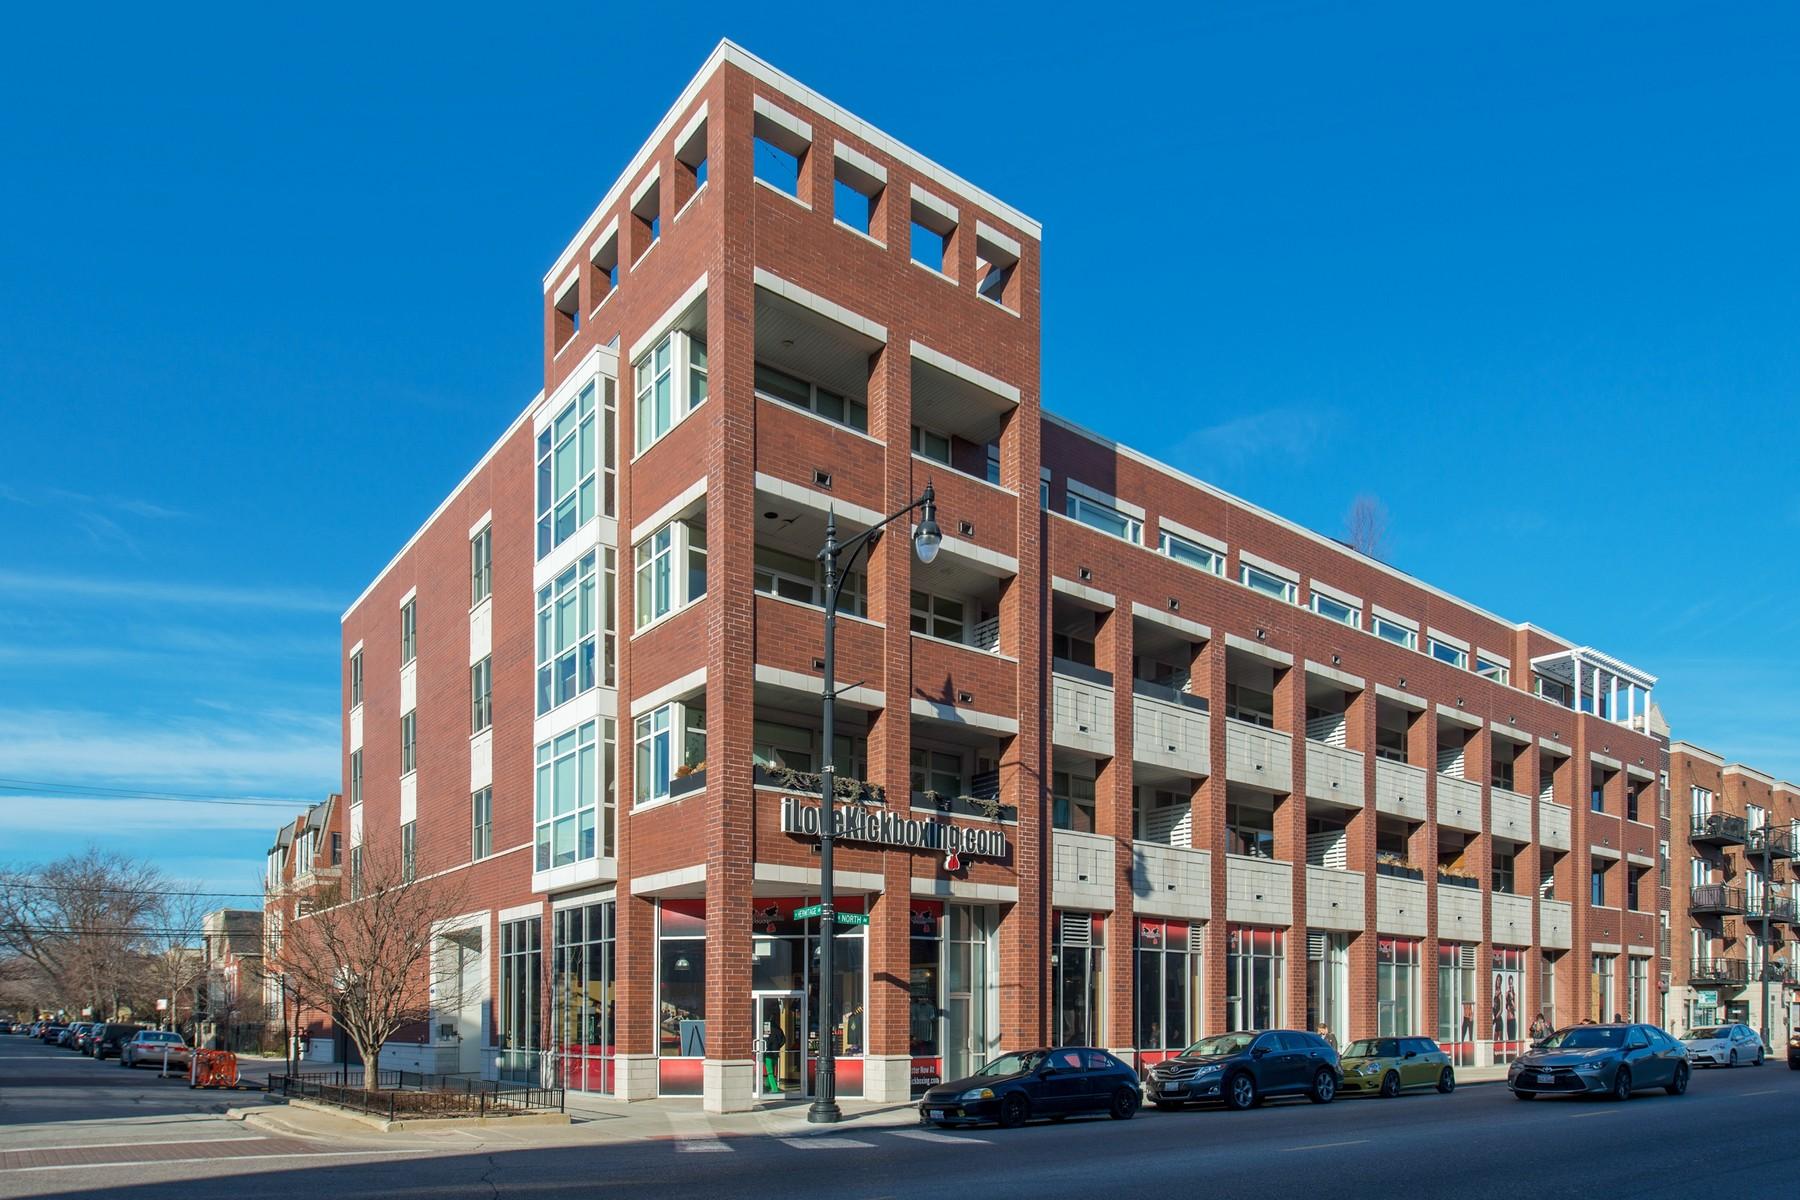 Condominium for Sale at Stunning Almost-New Construction 1611 N Hermitage Avenue Unit 206, Logan Square, Chicago, Illinois, 60622 United States